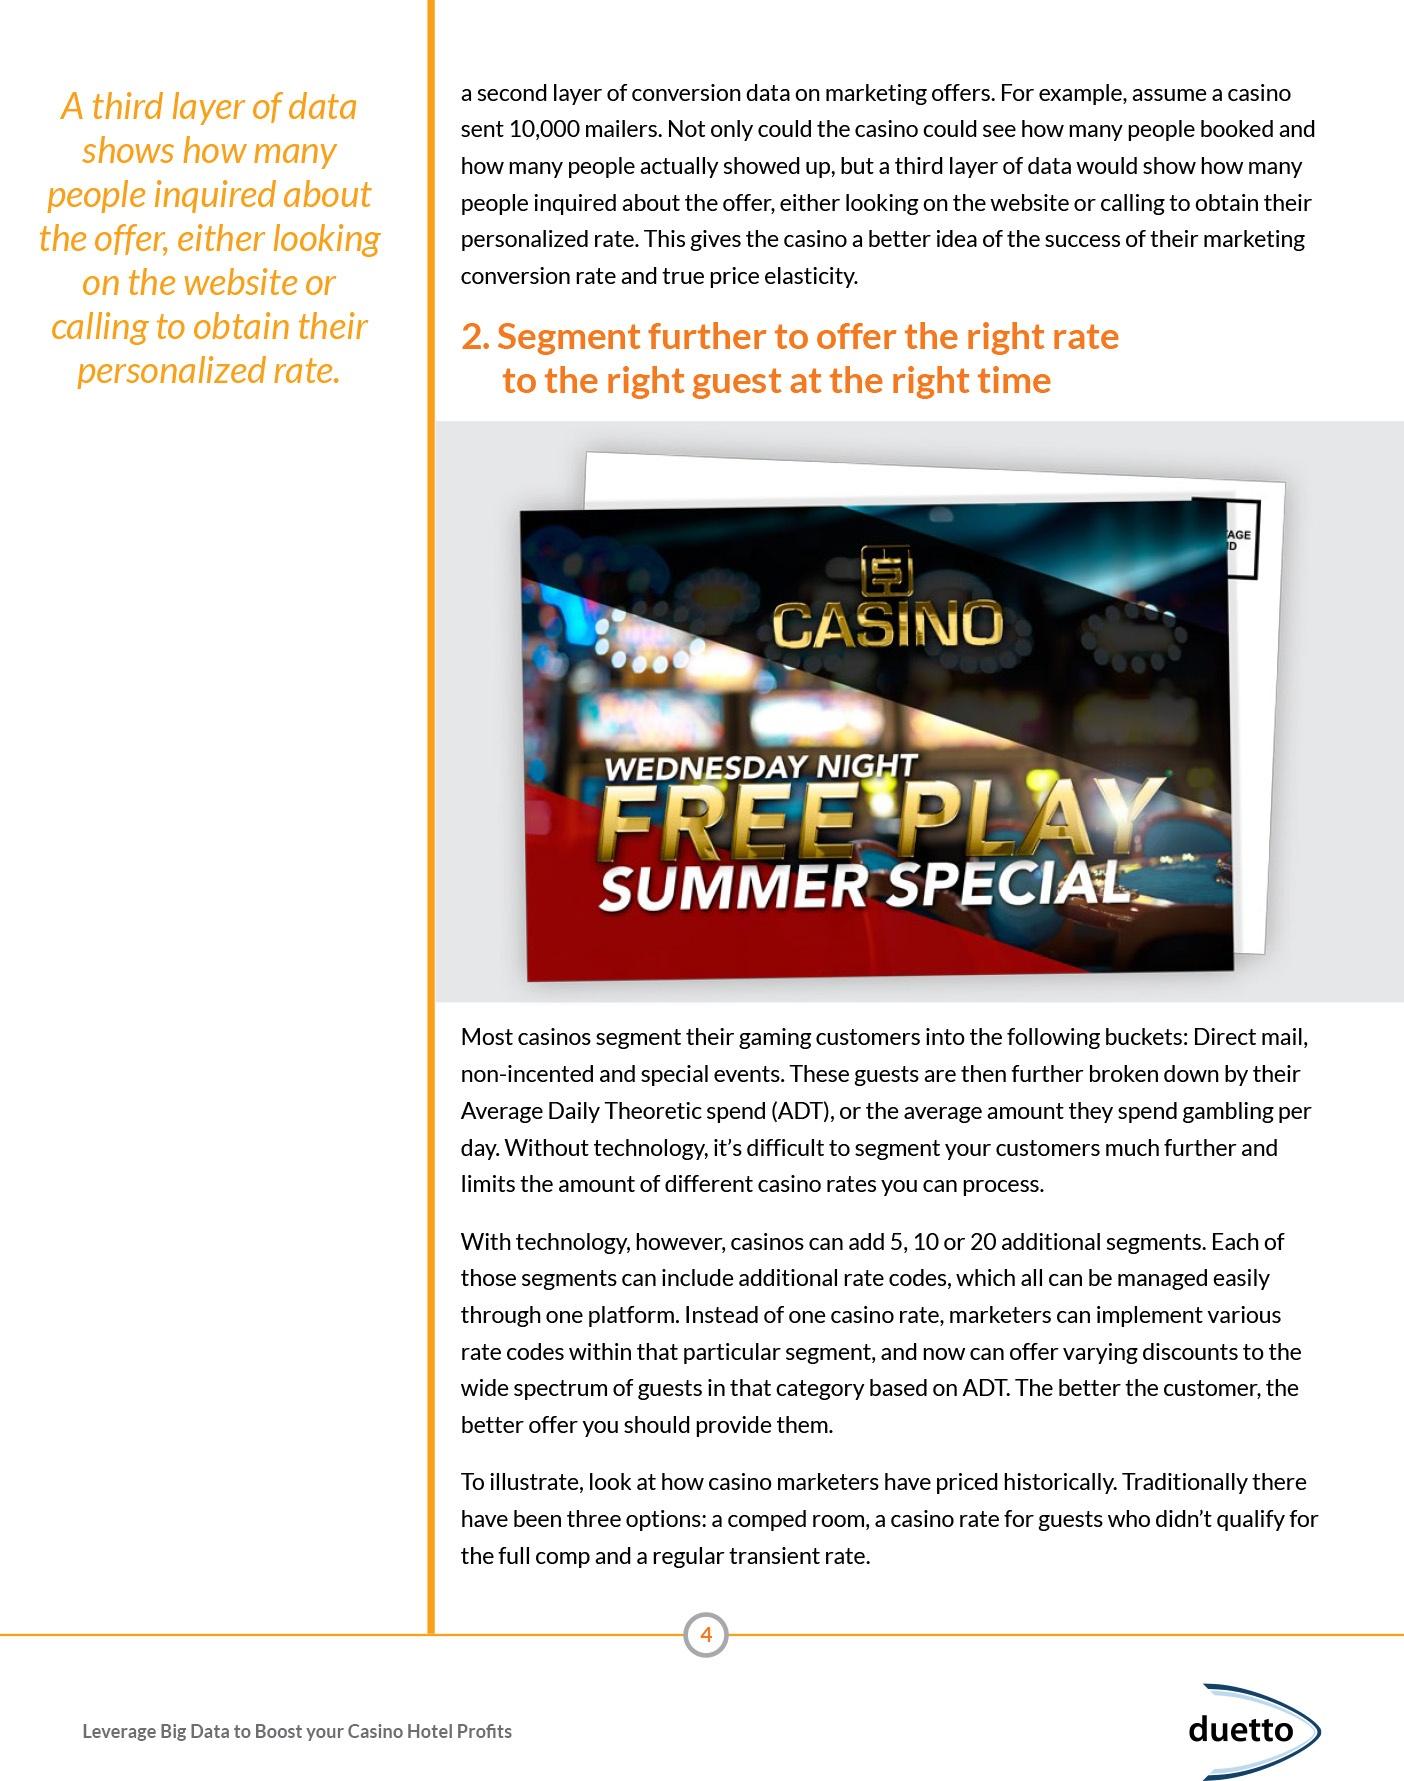 4Leverage-Big-Data-to-Boost-your-Hotel-Casino-Profits-4.jpg